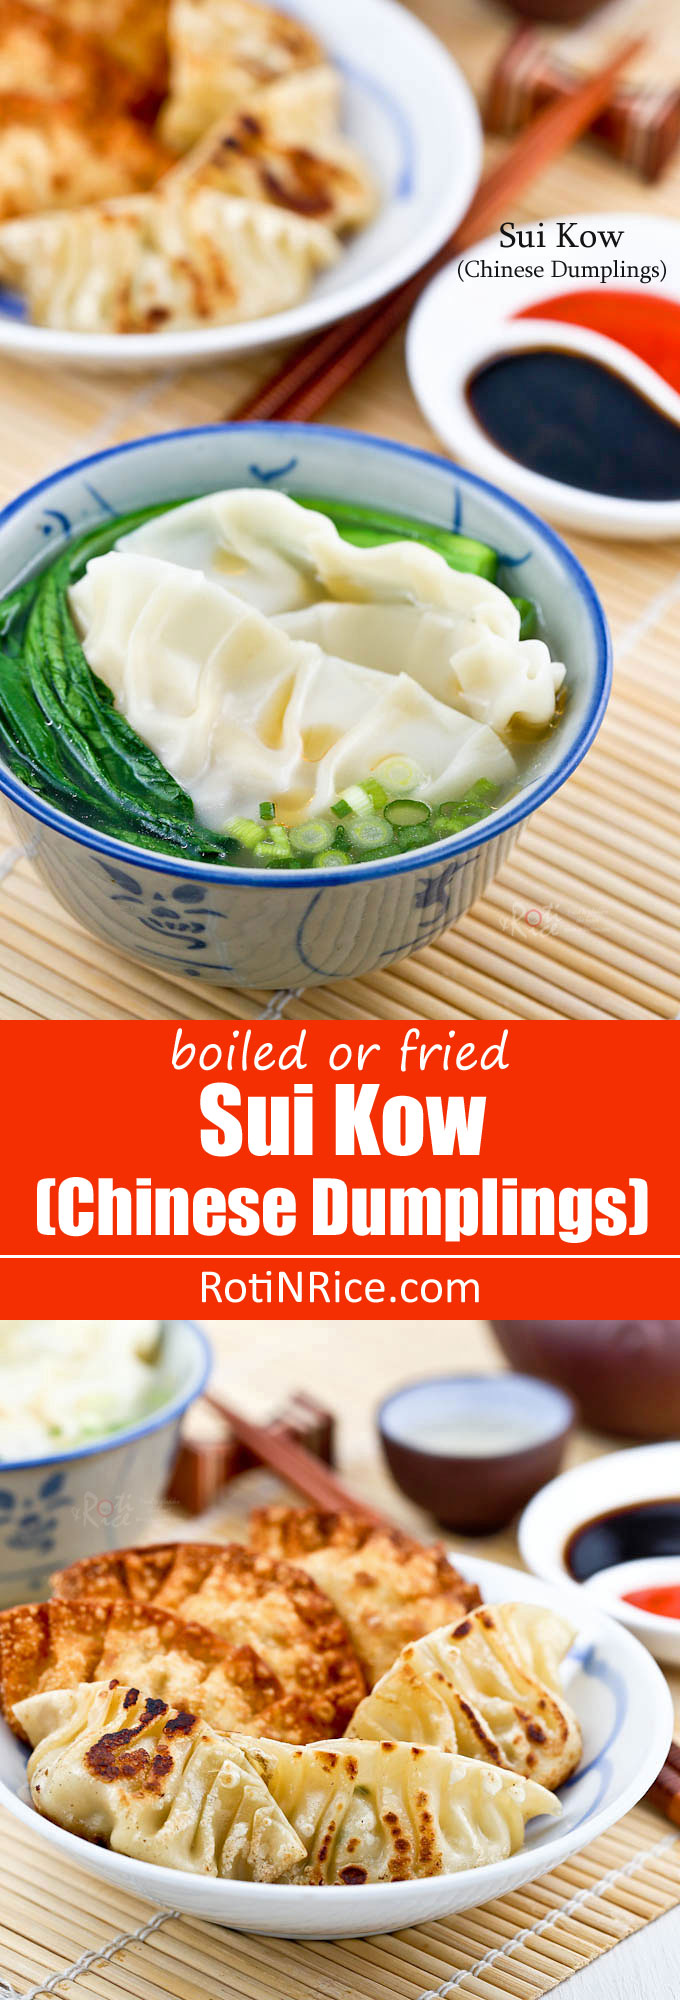 Sui Kow (Chinese Dumplings) are delicious fan shaped dumplings served ...